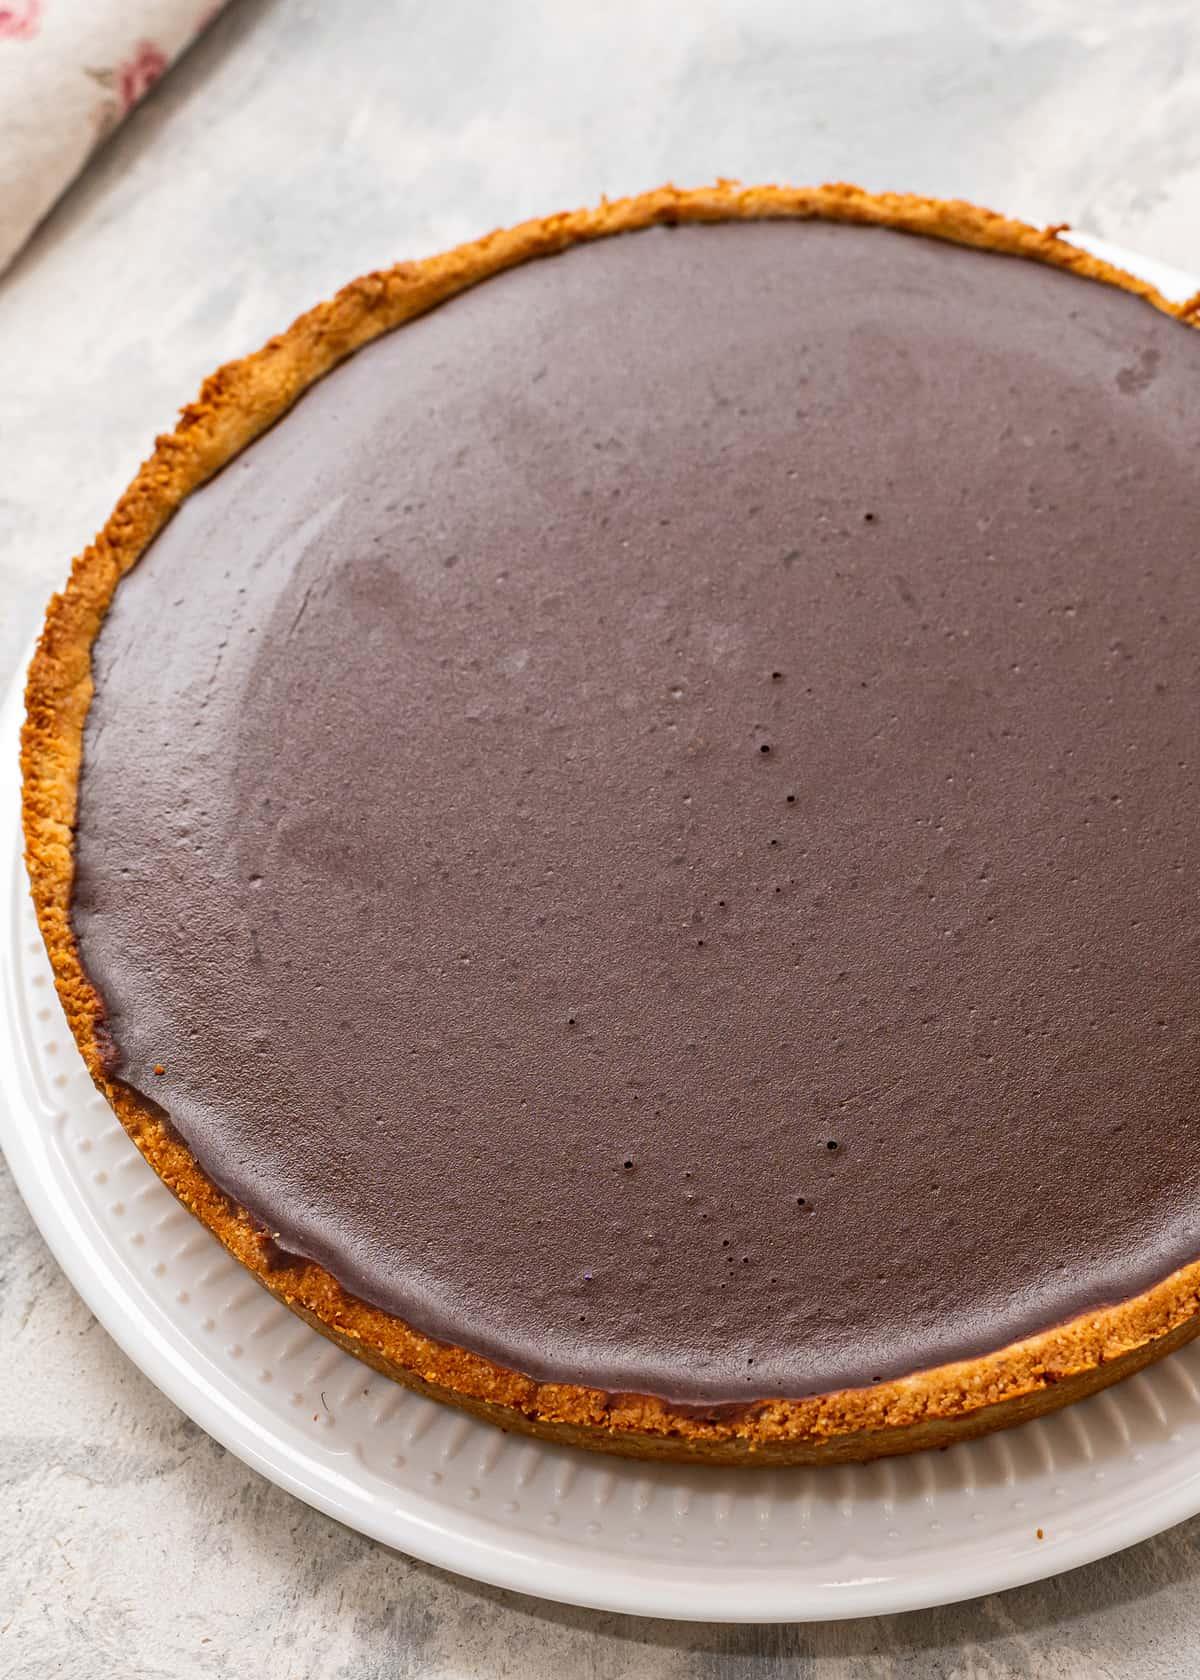 A gluten-free chocolate tart on a plate.